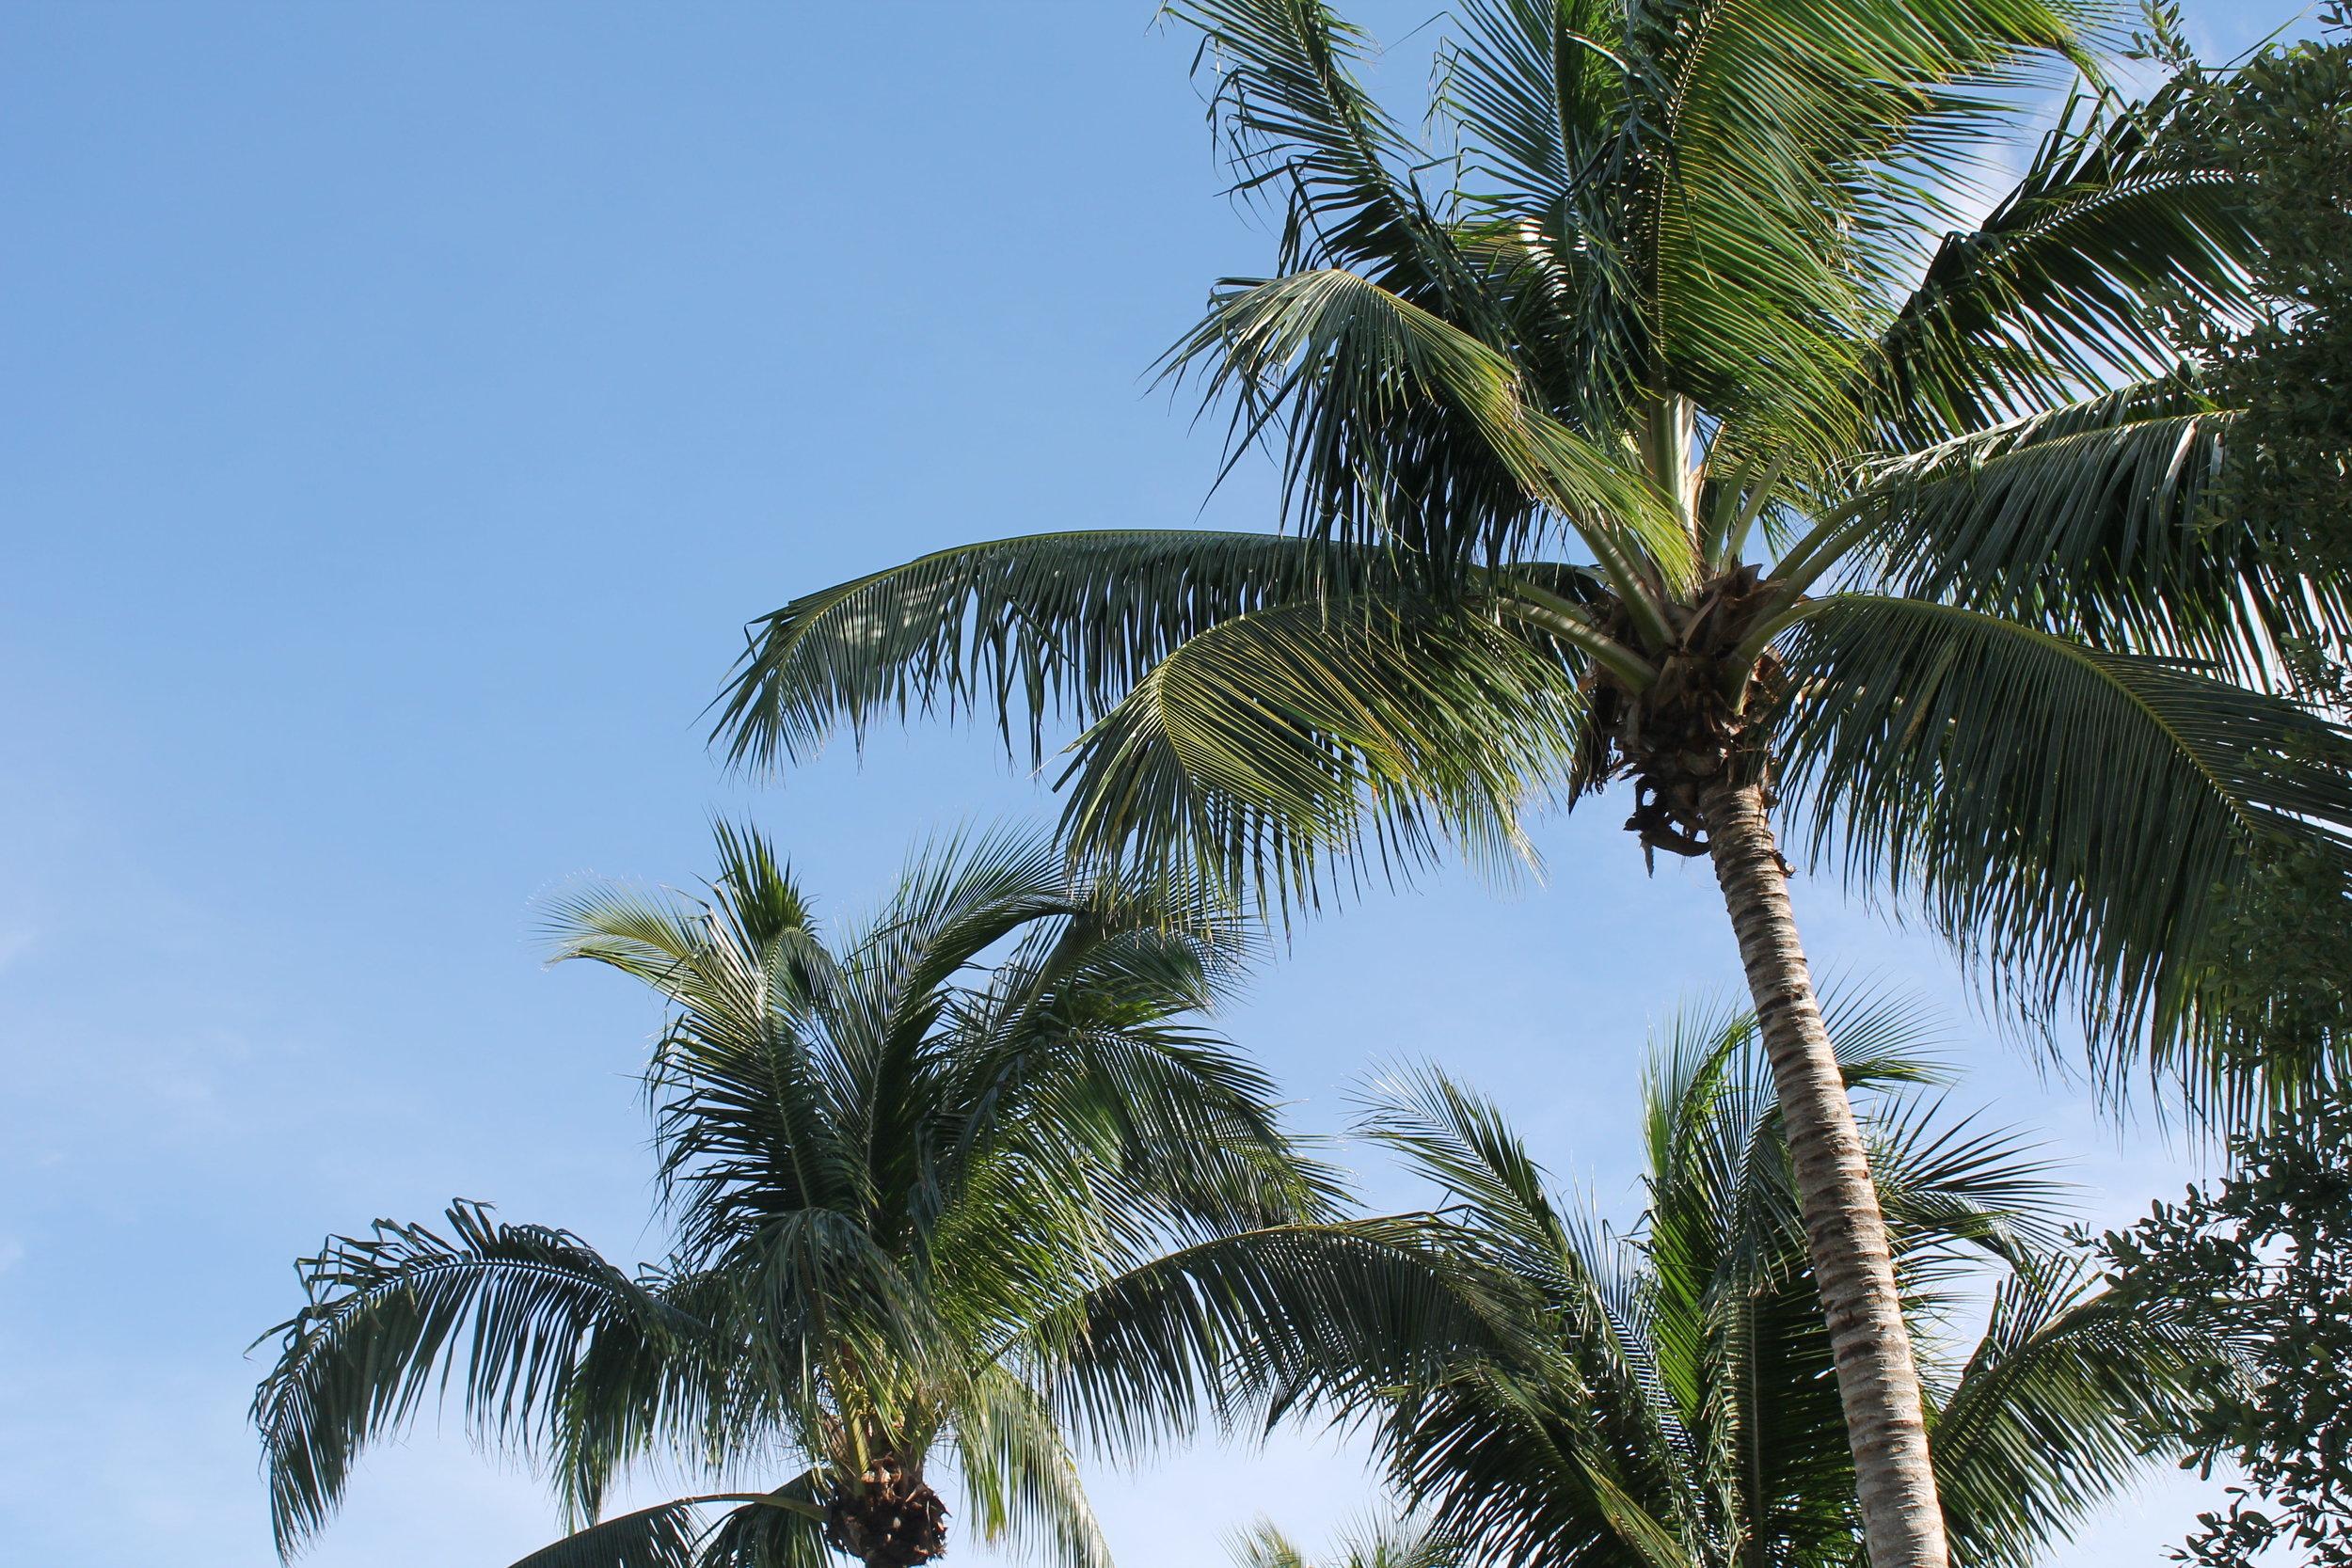 ¿Estás listo para tropicalizar tu idea de negocios?